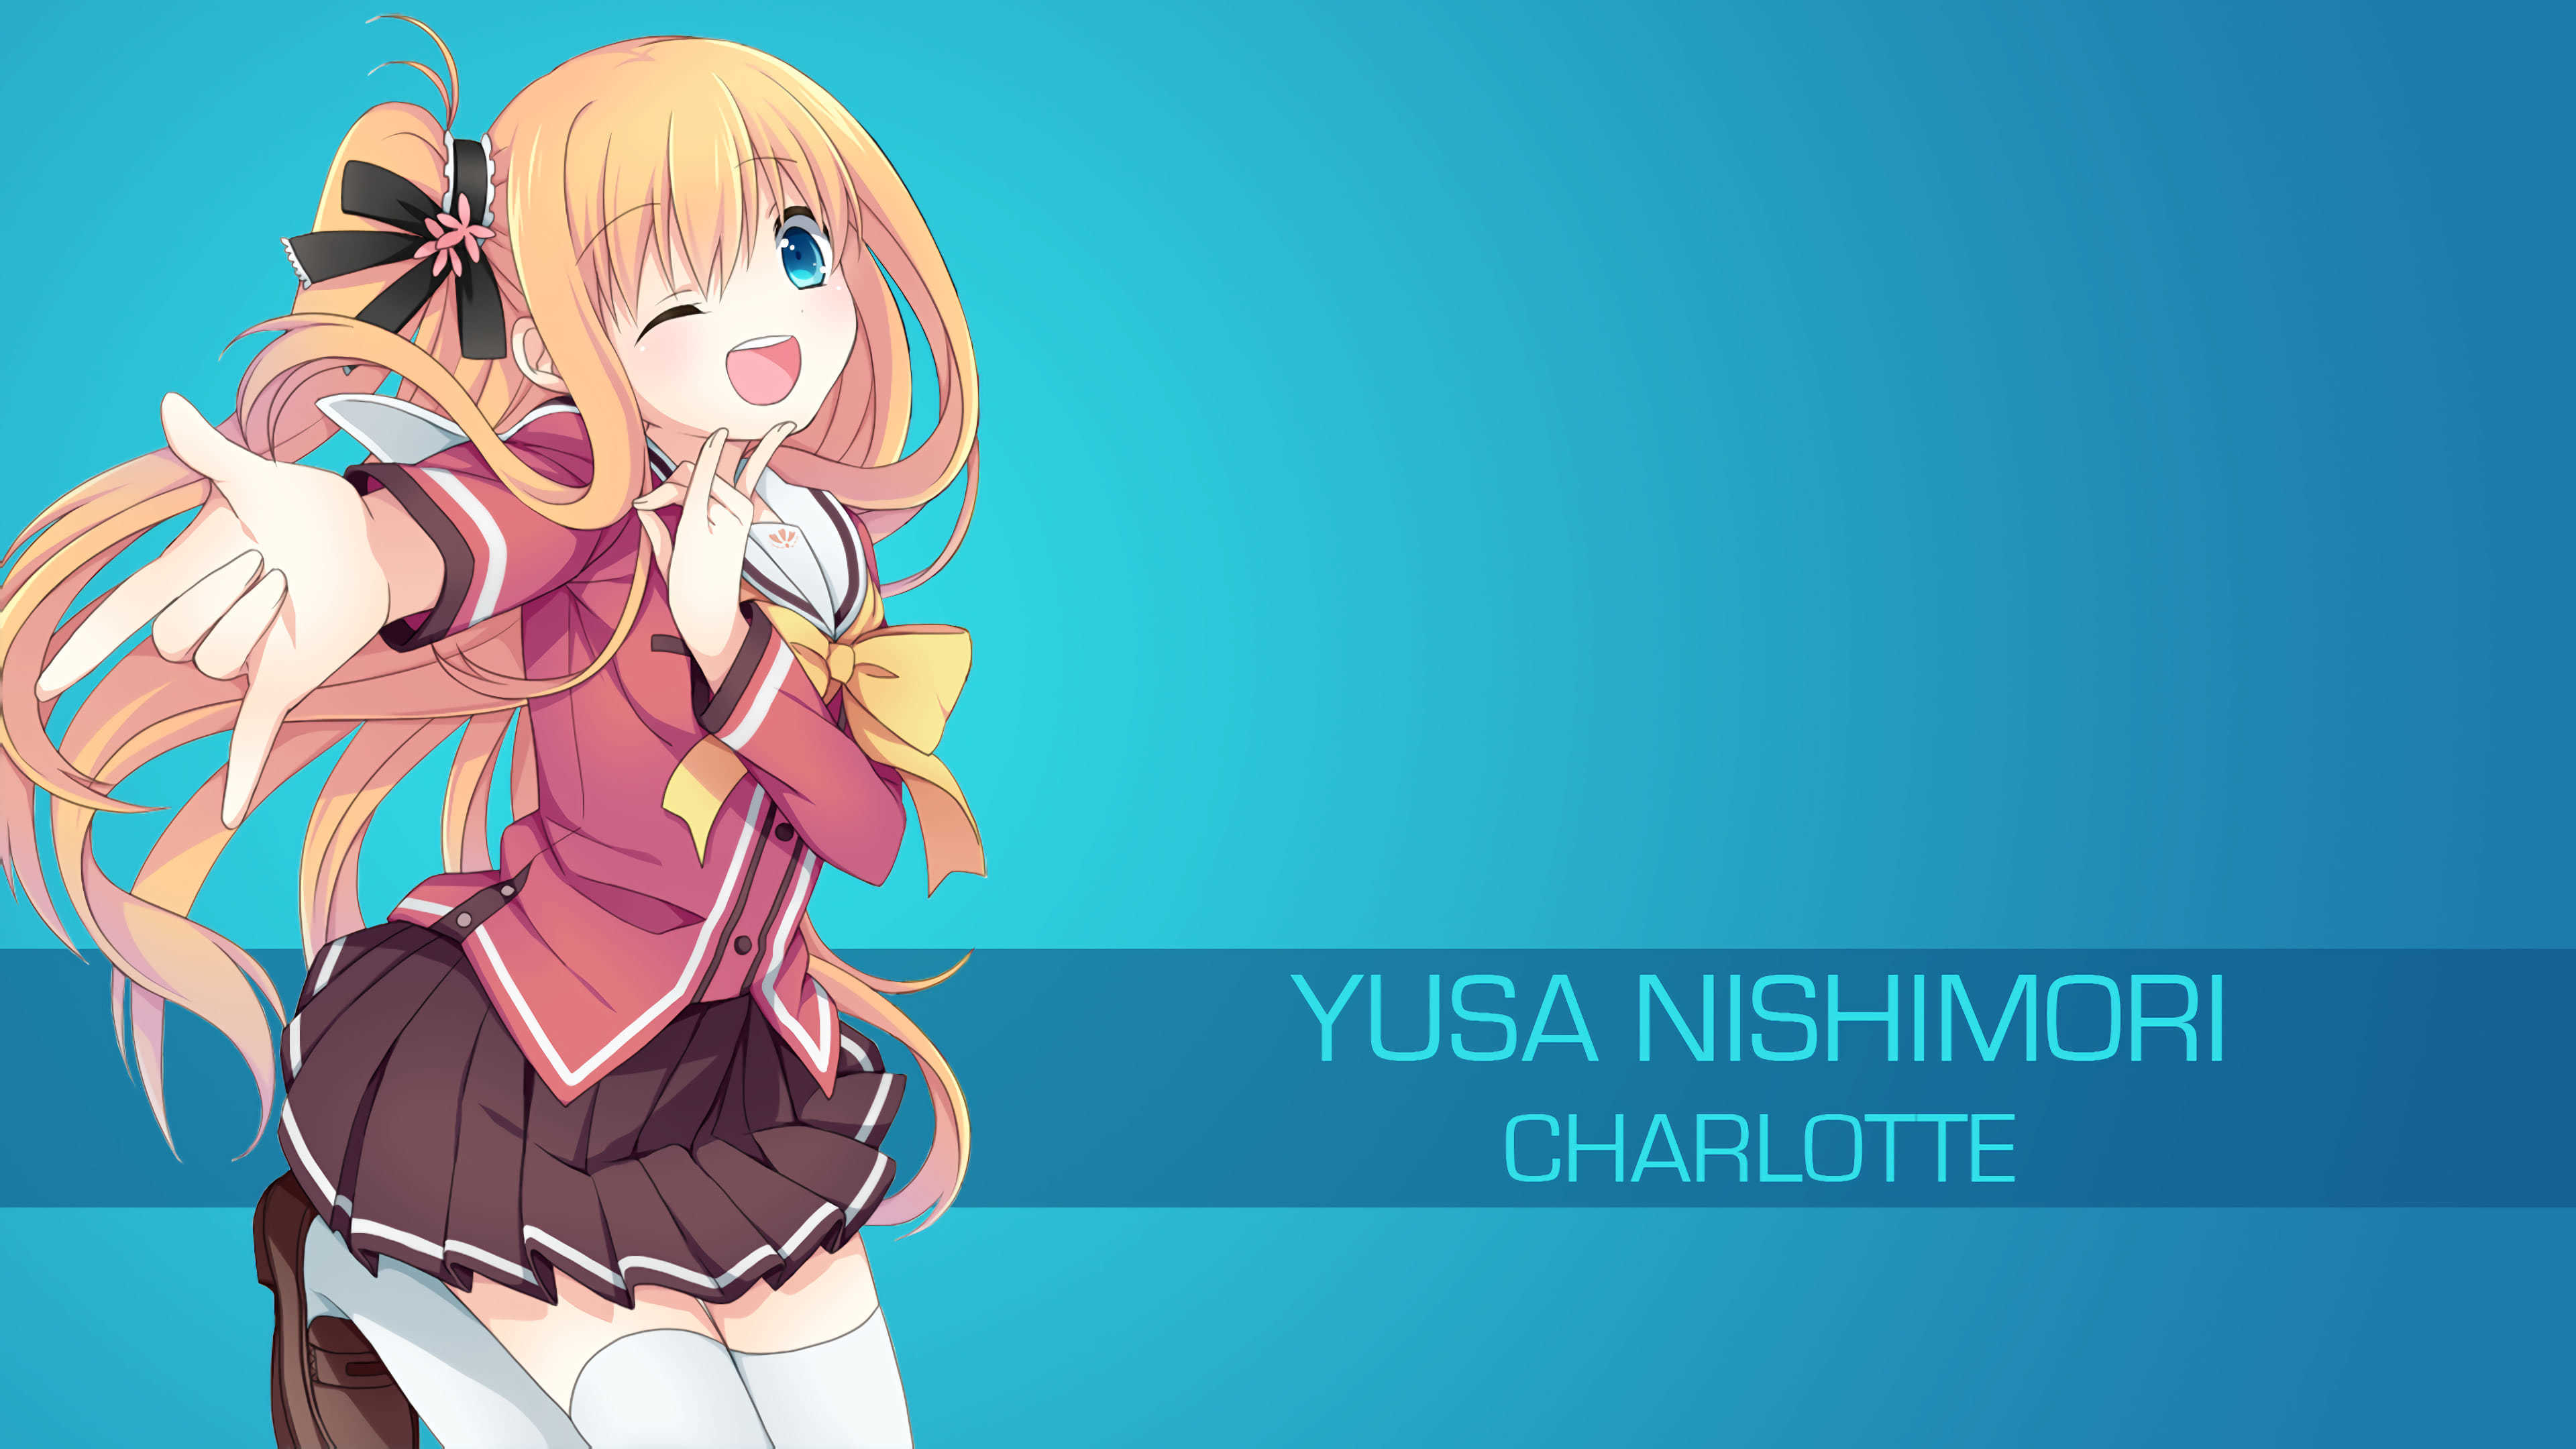 yusa nishimori charlotte uhd 4k wallpaper